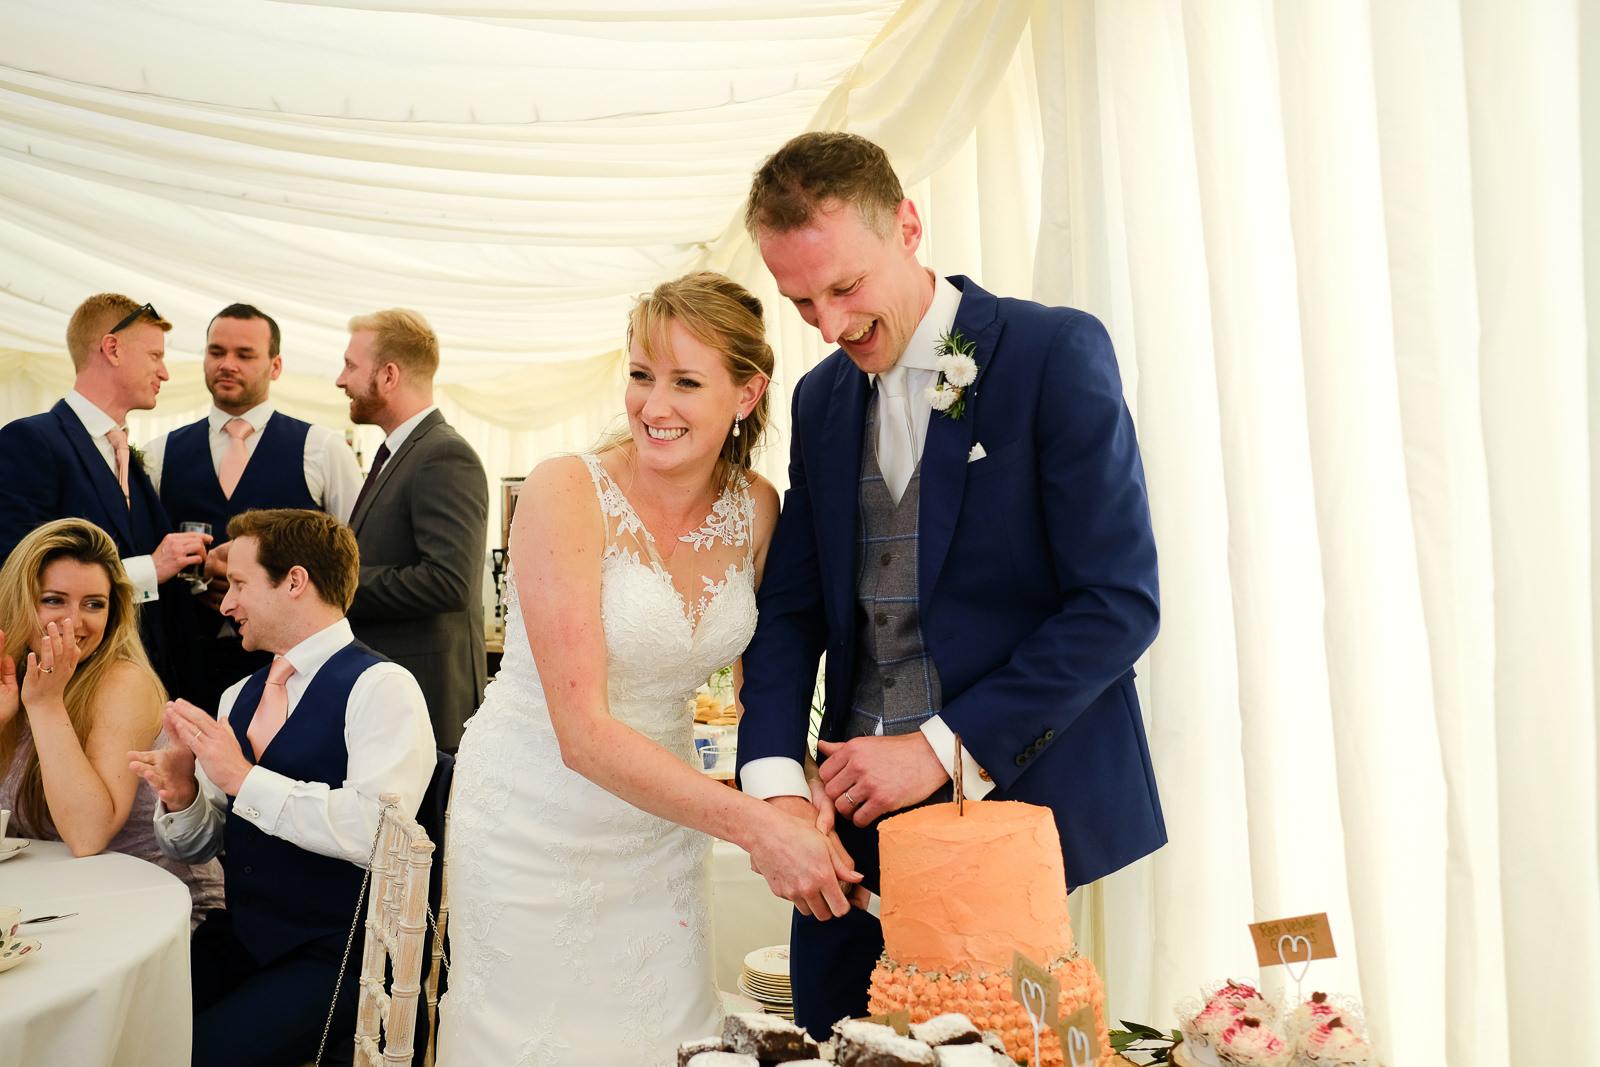 Roscarrock Farm wedding in Cornwall 069.jpg